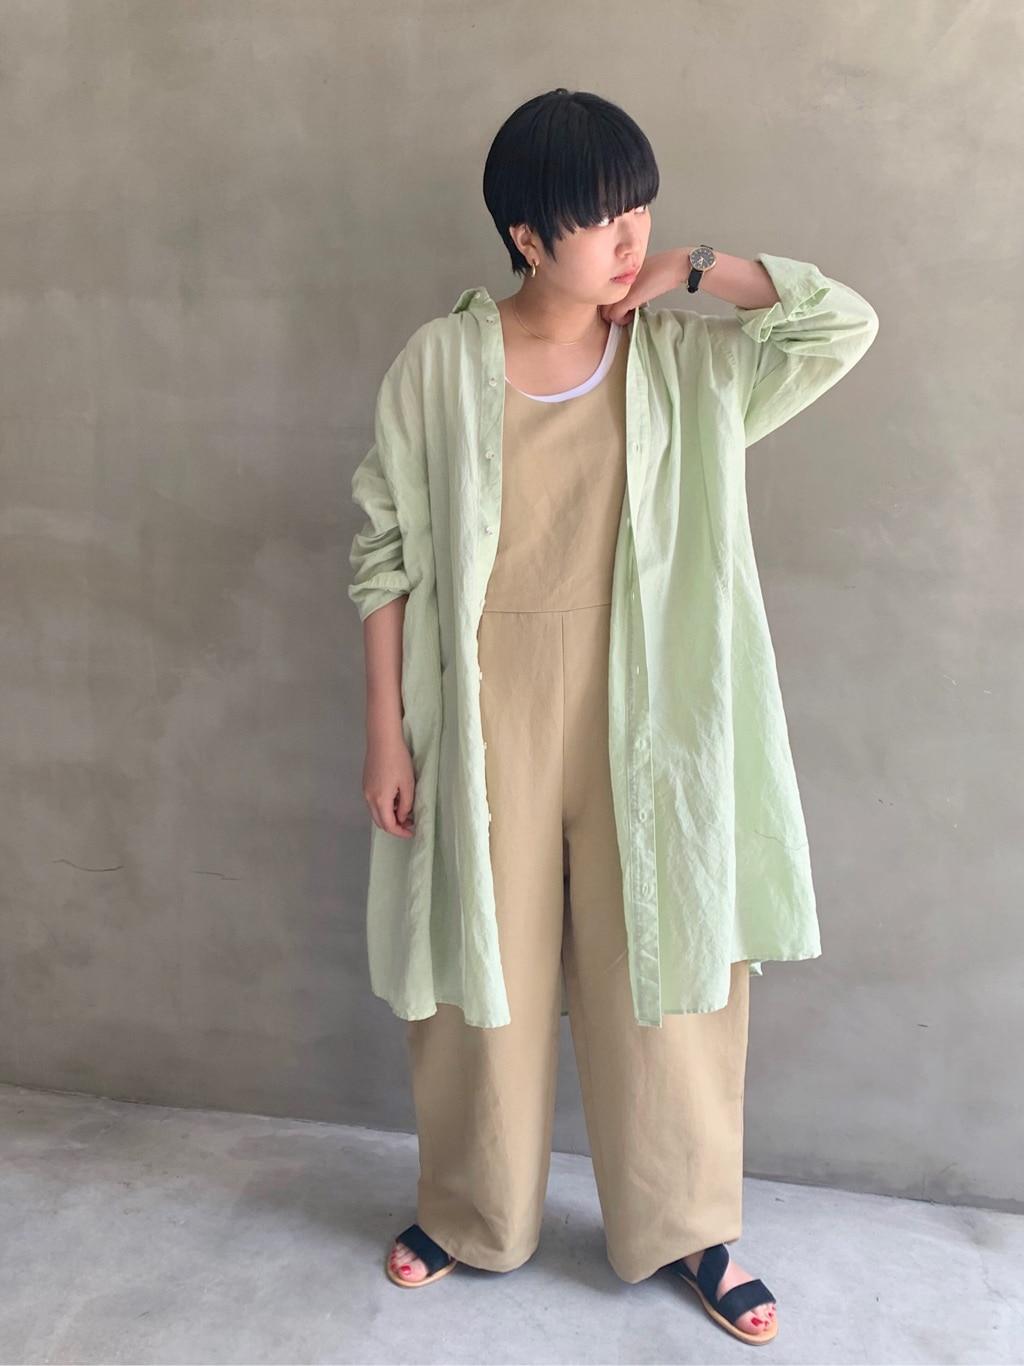 AMB SHOP l'atelier du savon FLAT AMB 天神イムズ 身長:156cm 2020.07.09